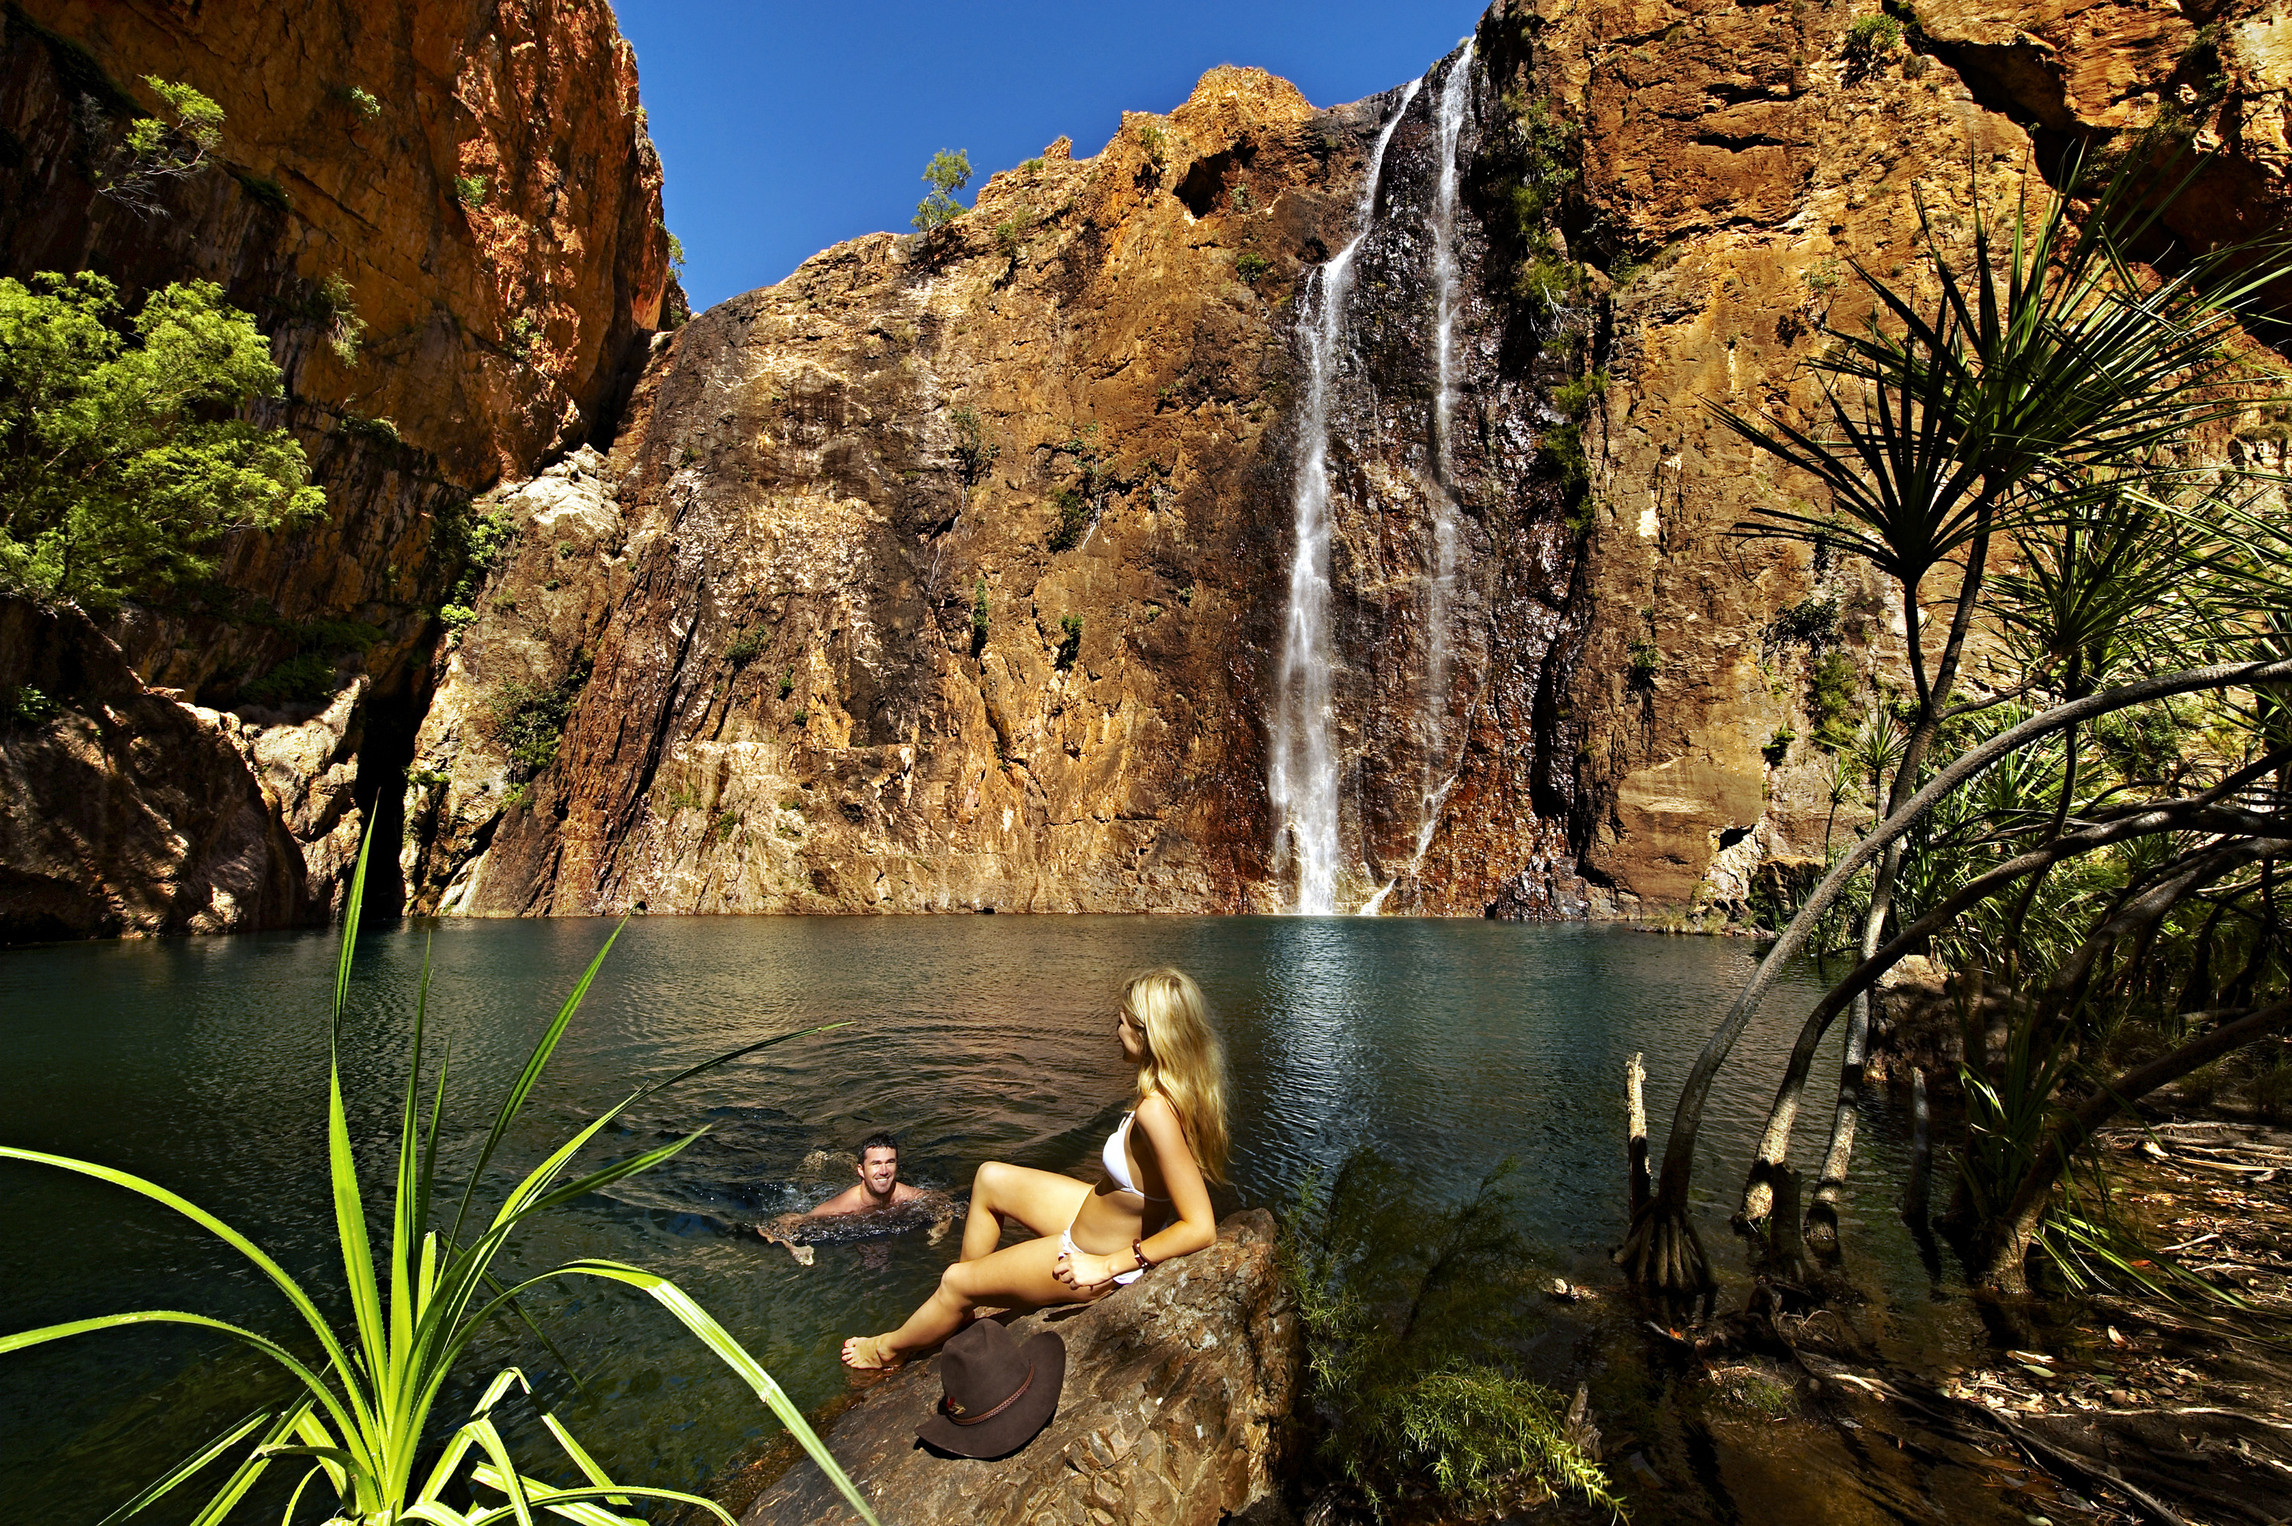 Miri Miri Falls, El Questro, Kimberley, Western Australia